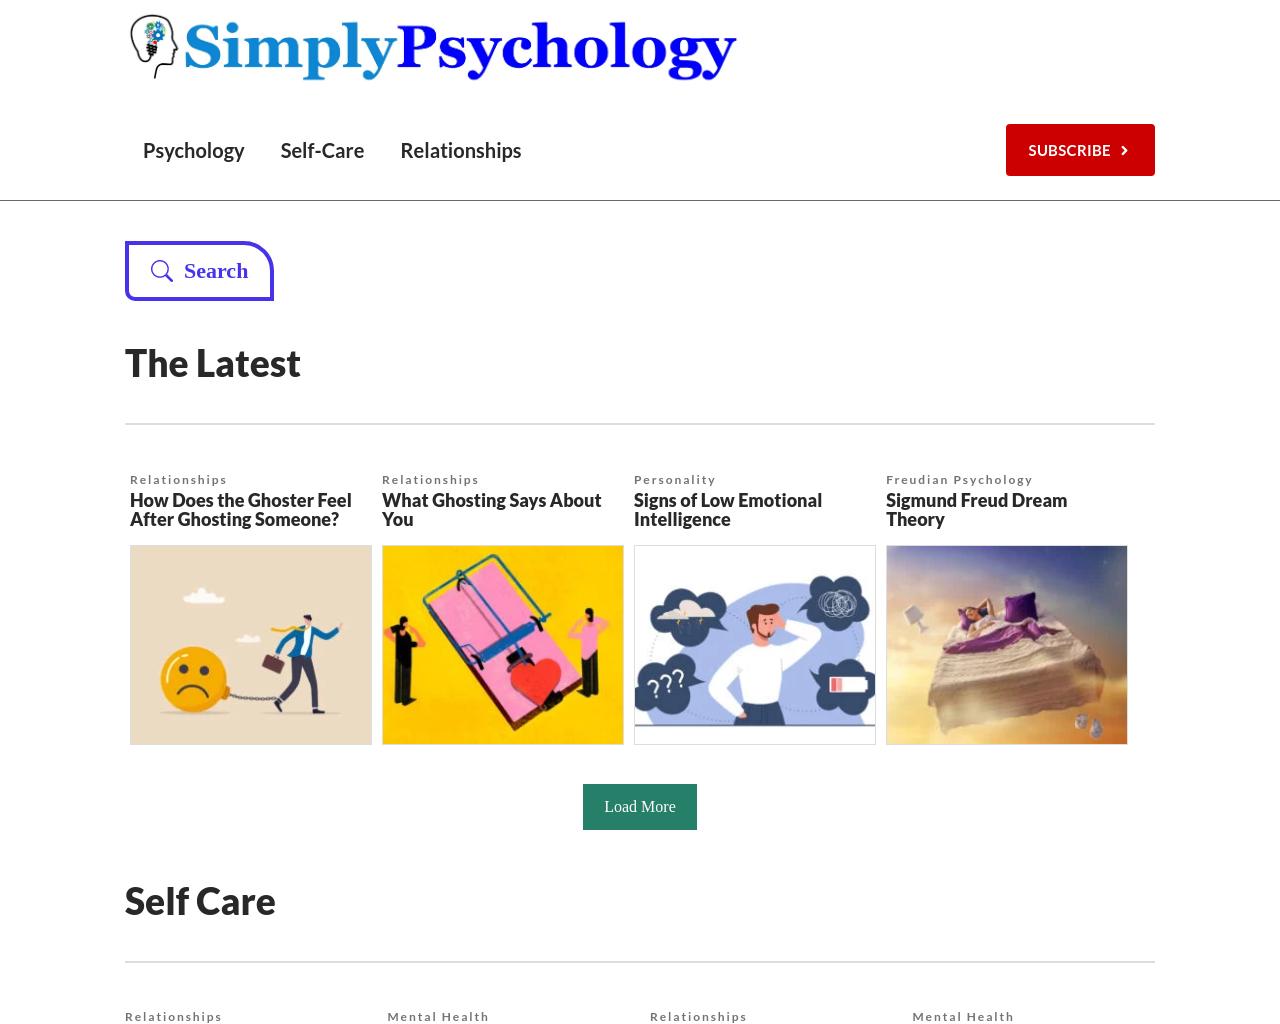 SimplyPsychology